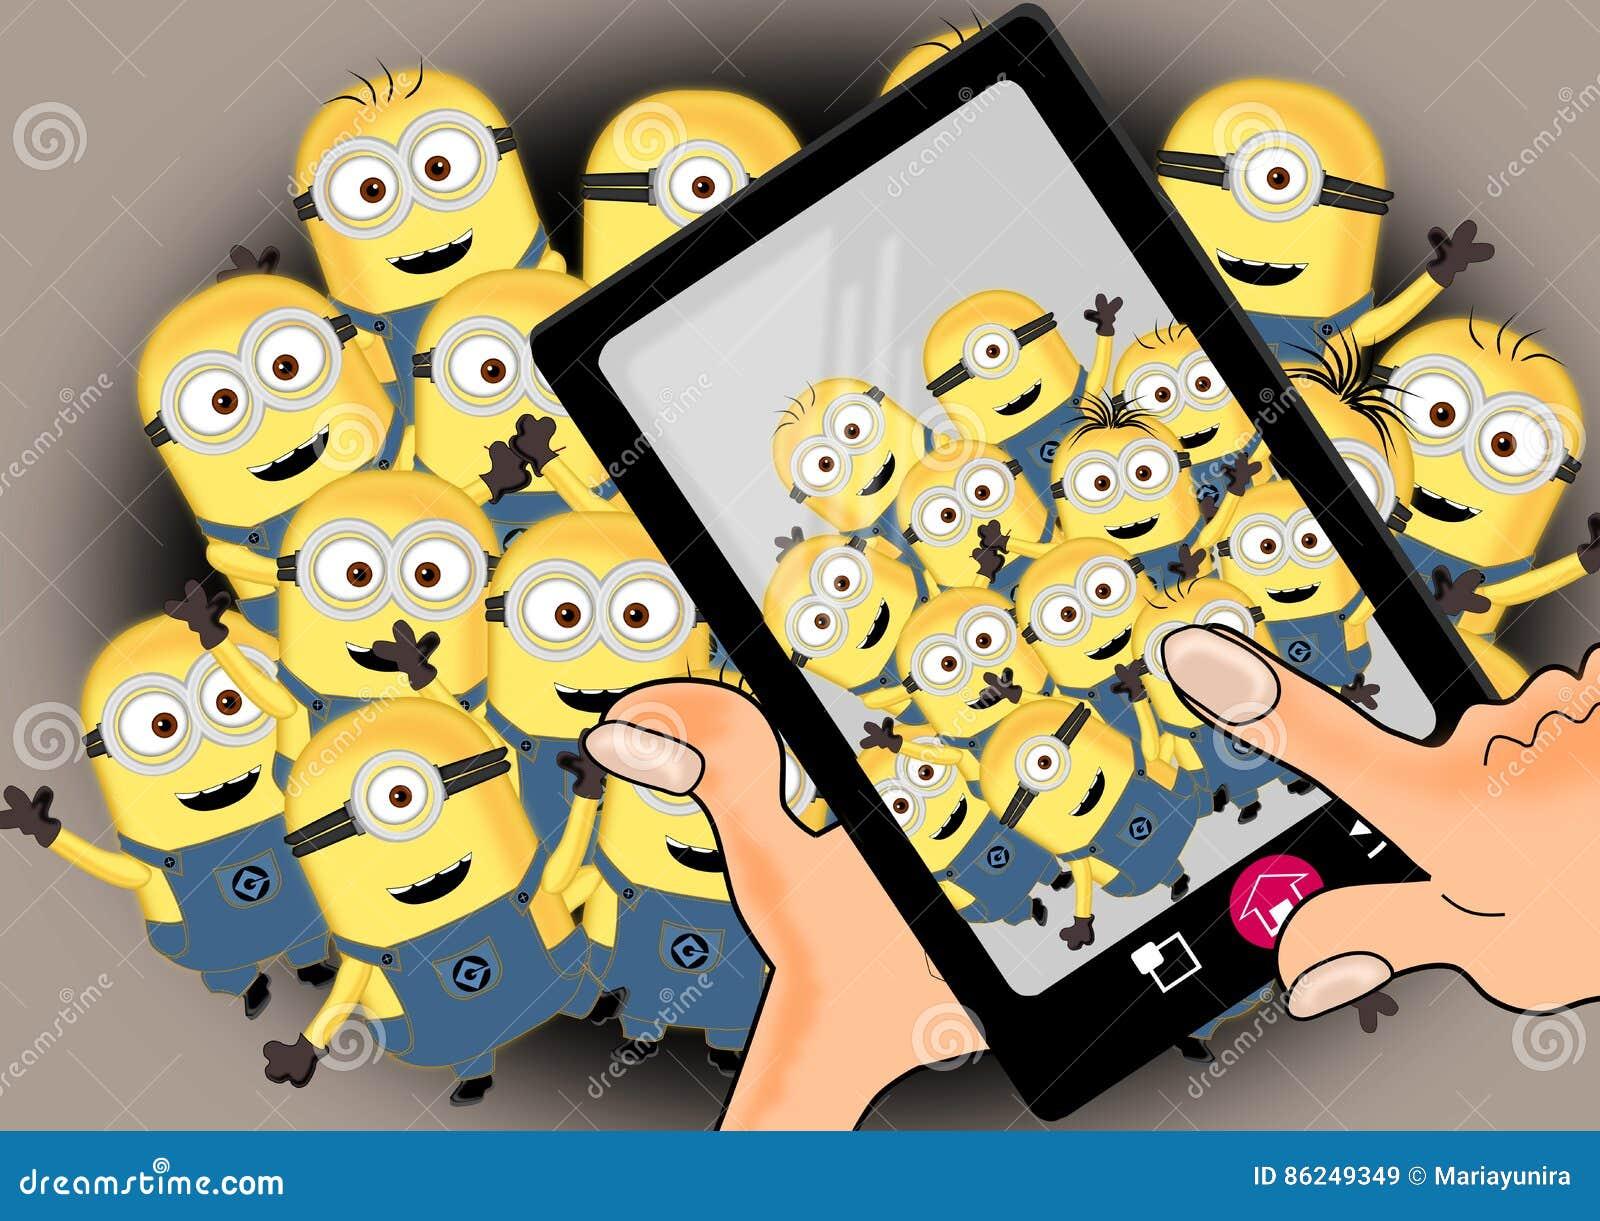 Minions on crowd